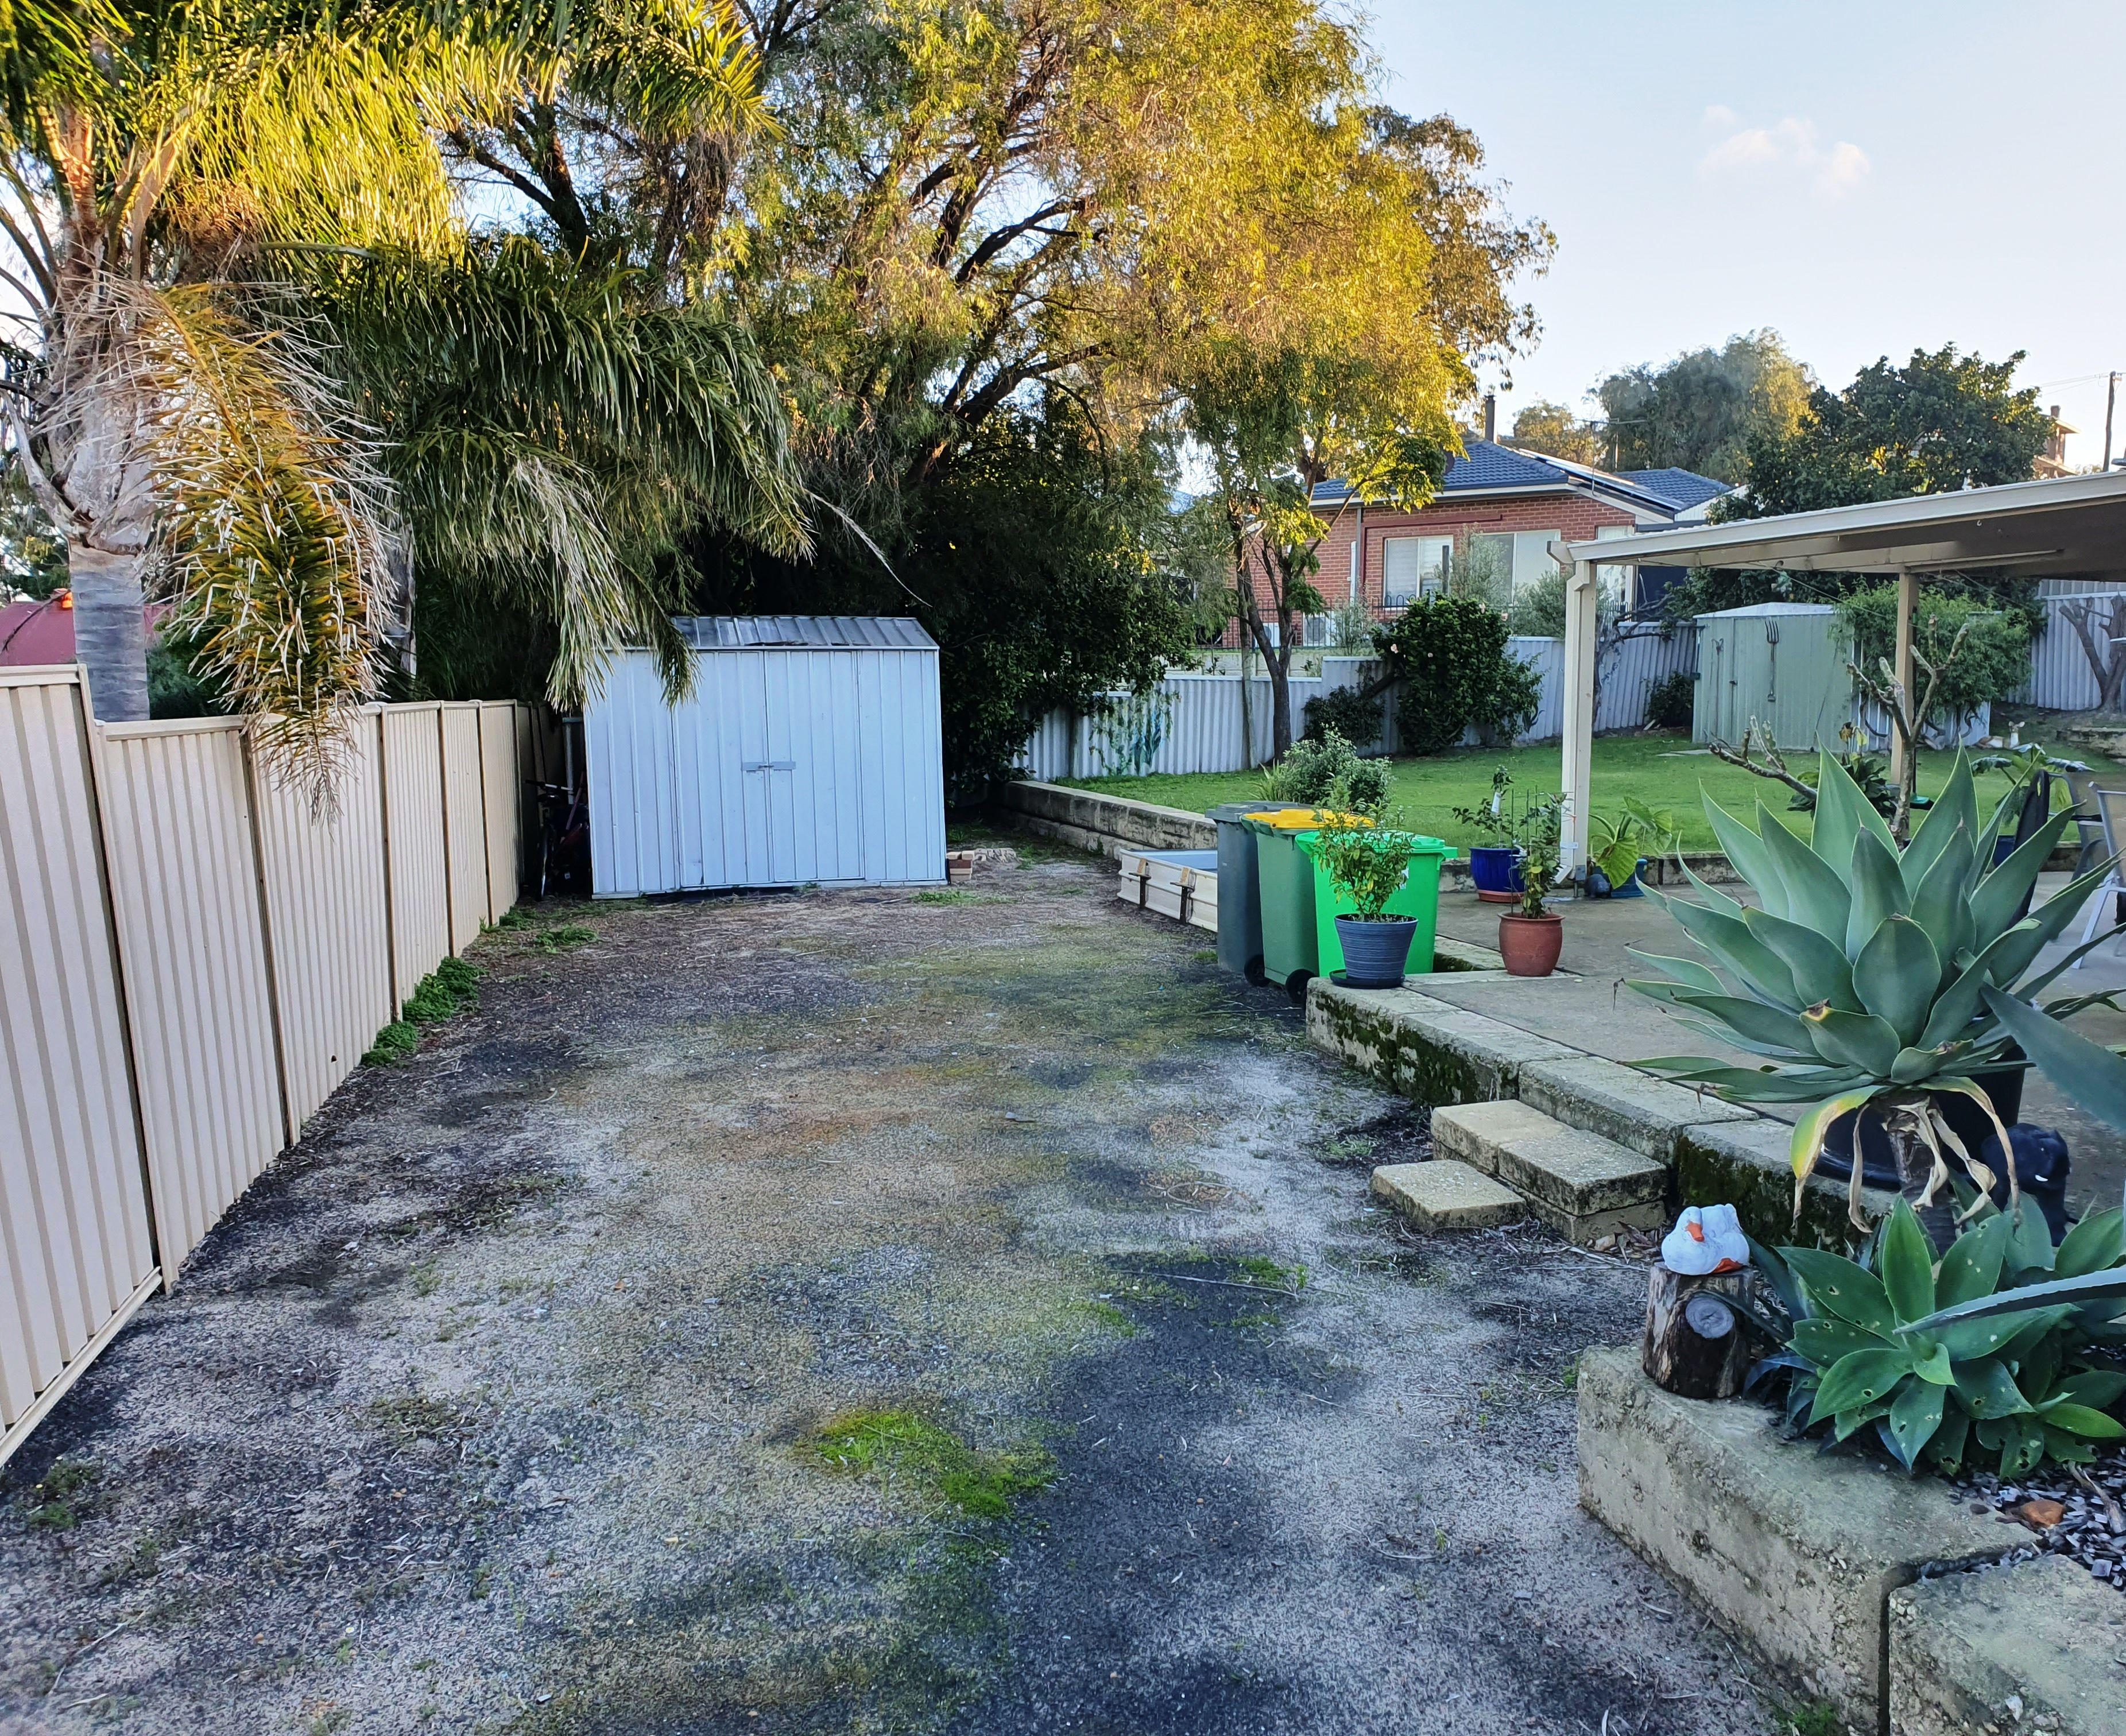 56 Mayne Way, Australind